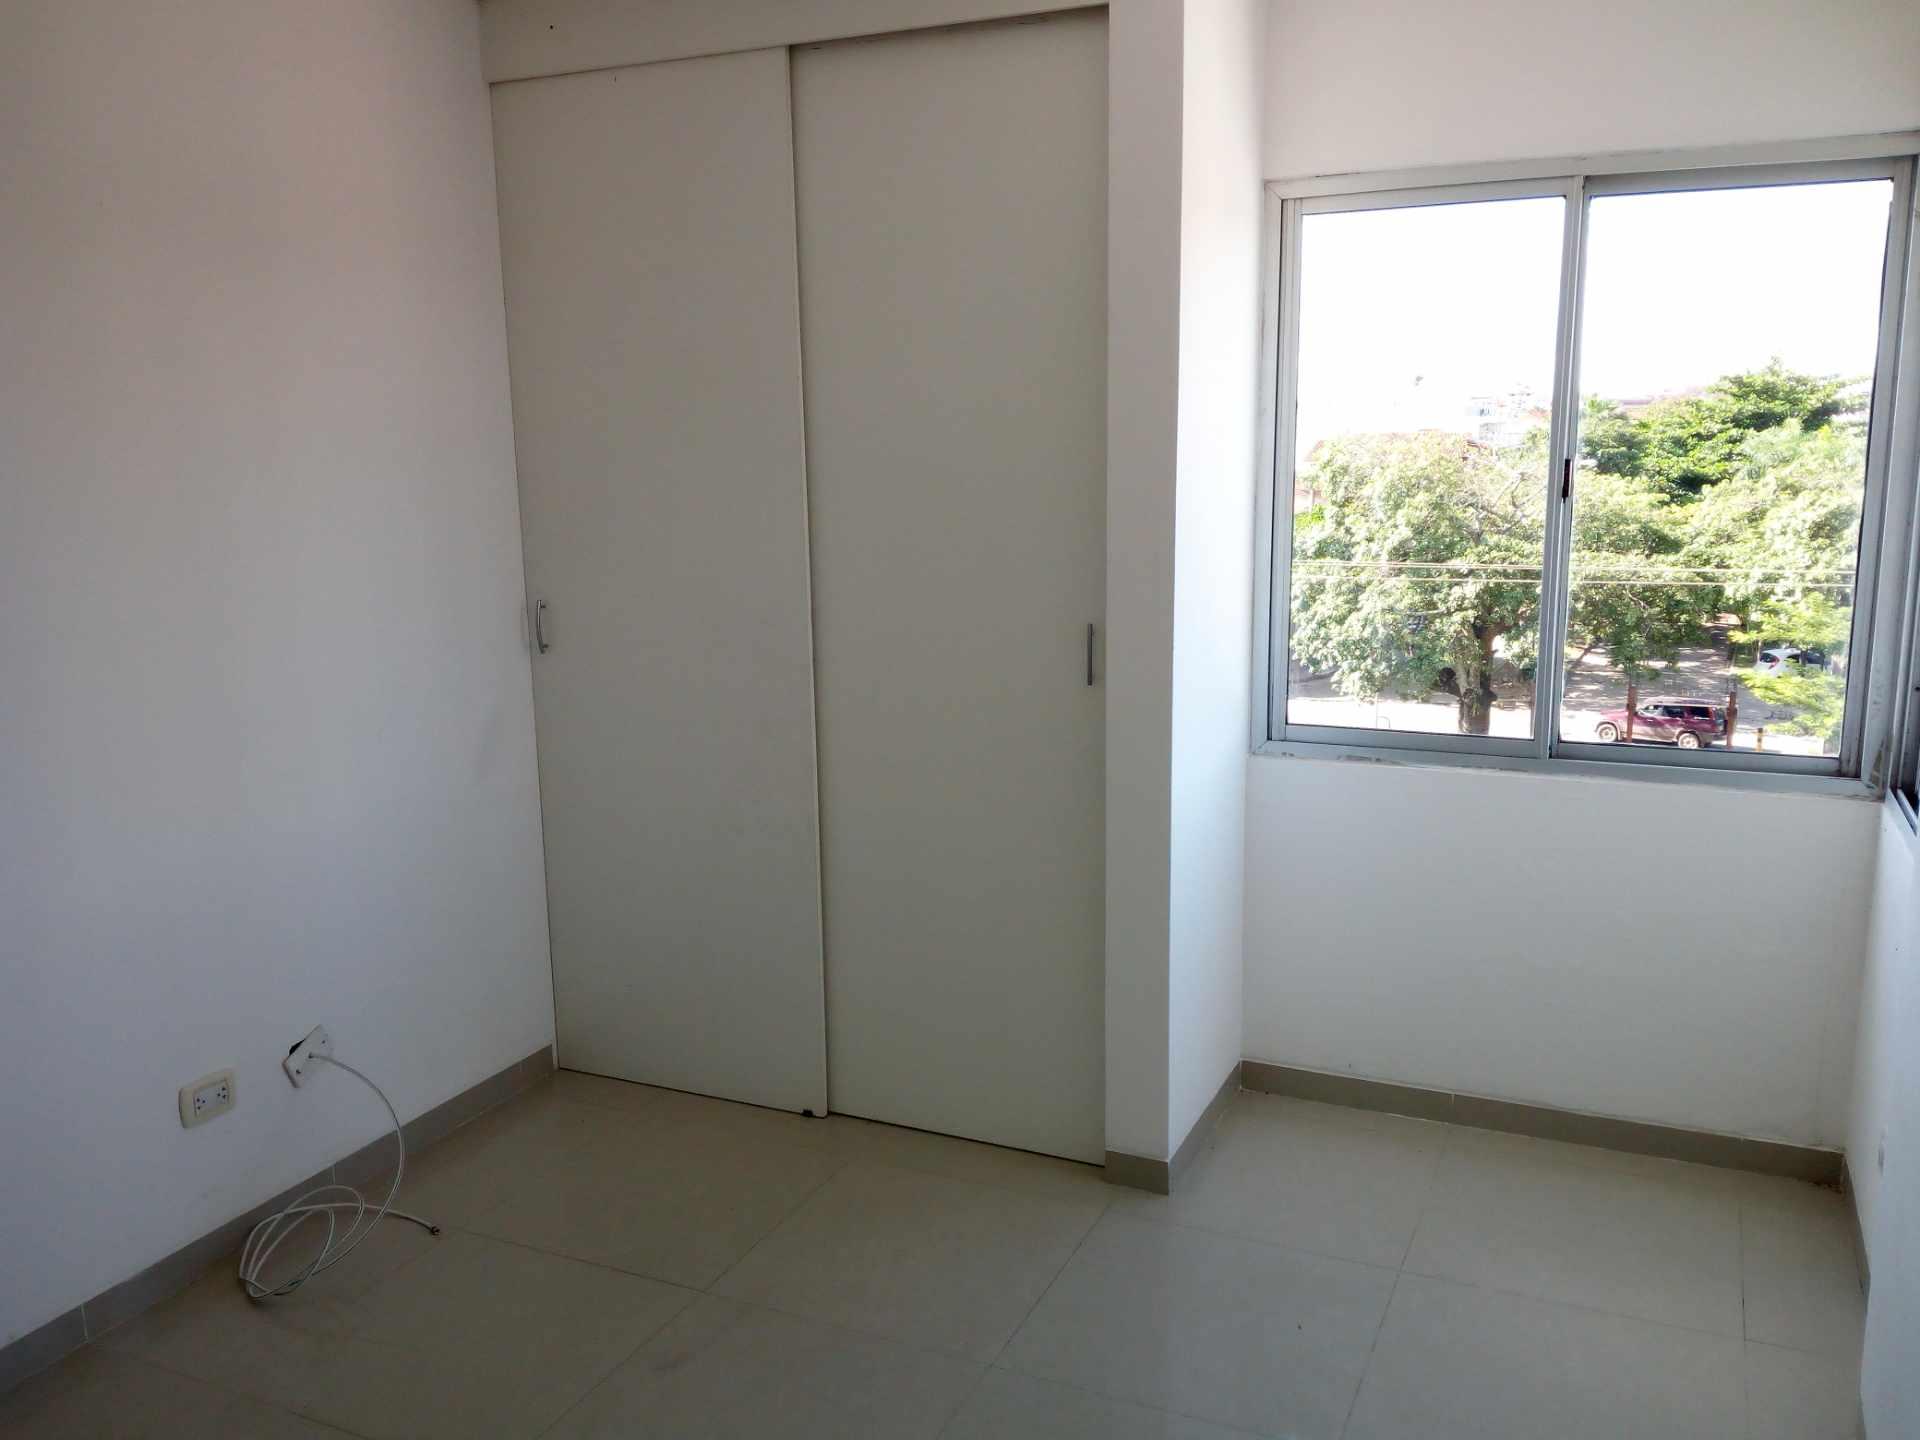 Departamento en Venta Entre 3er y 2do Anillo, Av. Guapay (Canal Cotoca) Foto 11